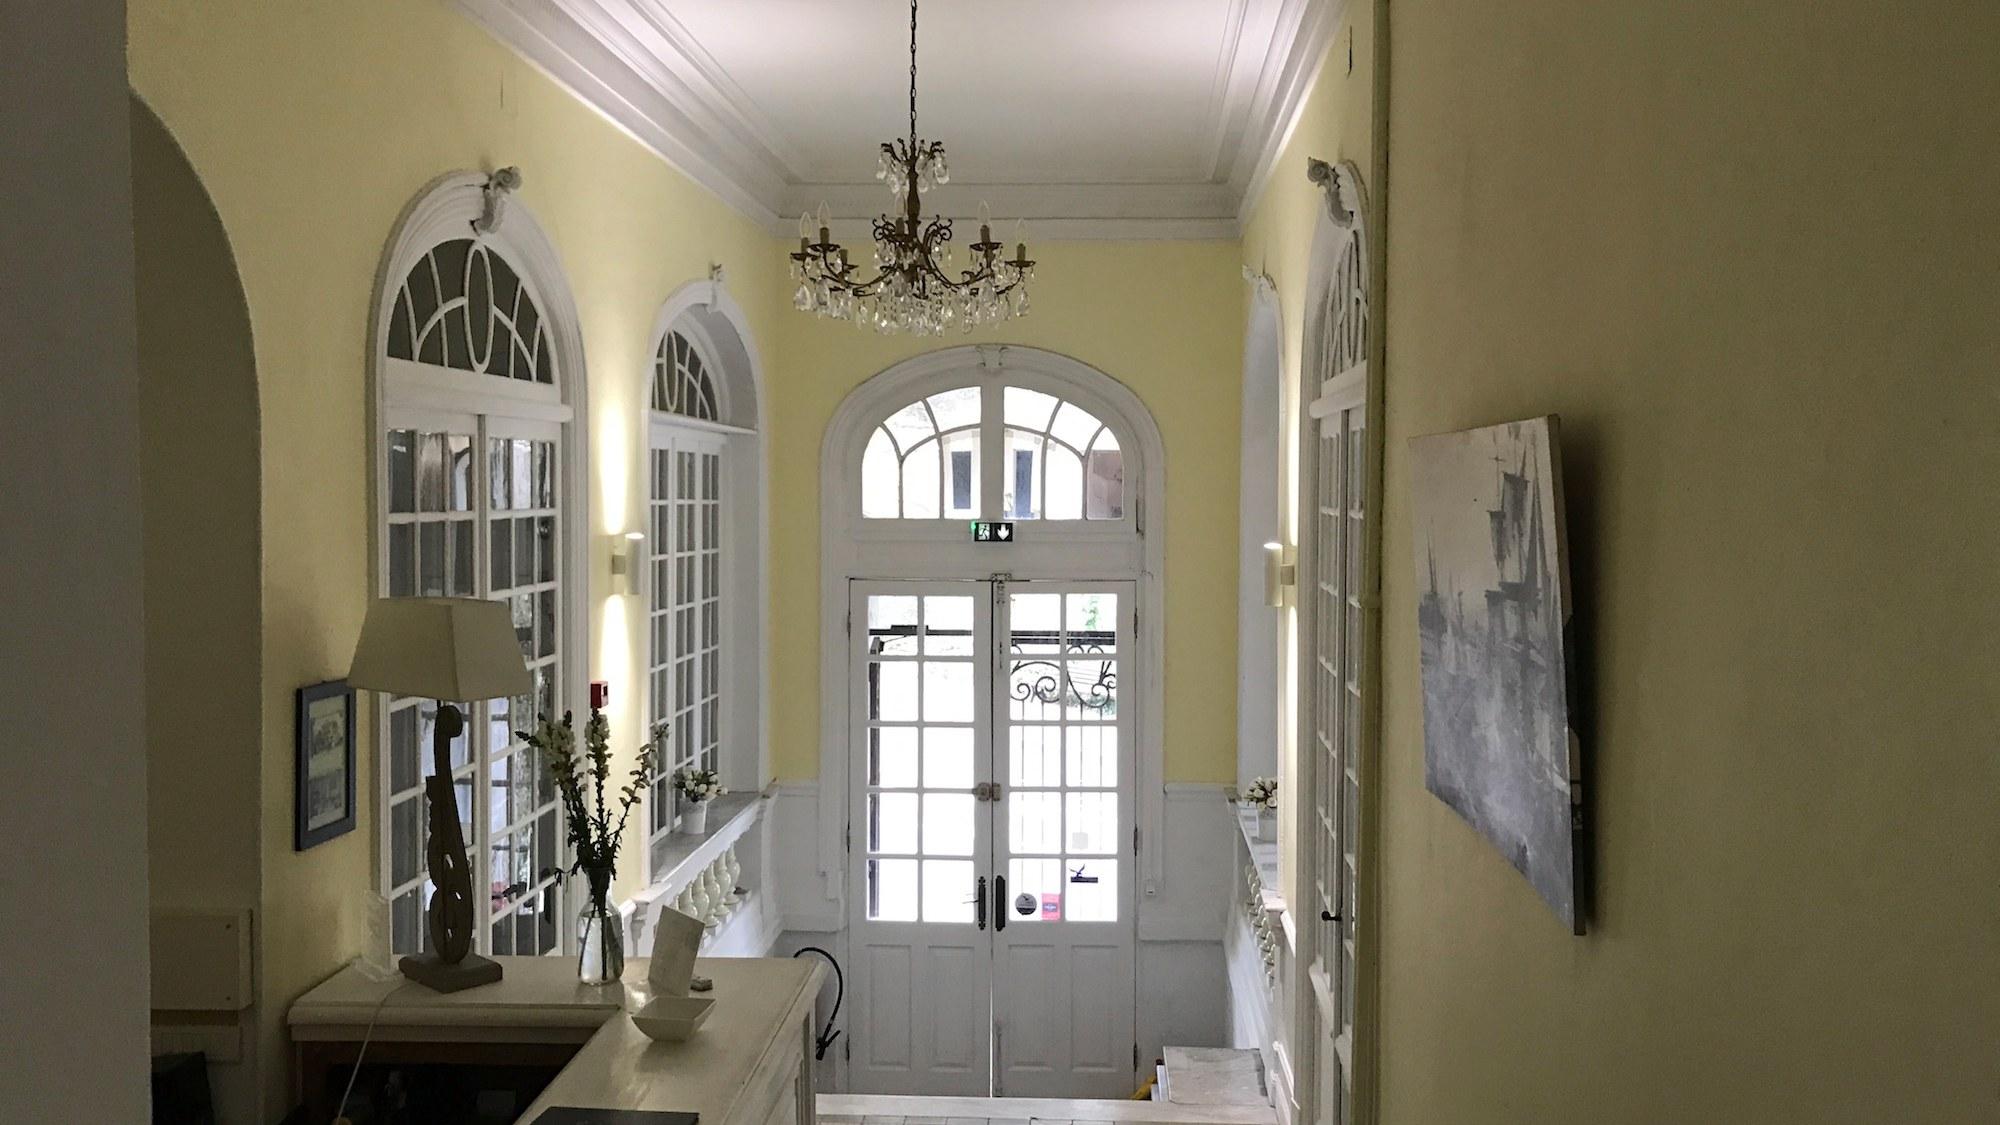 Réception Accueil Hotel Alexandra Juan les Pins Antibes Côte d'Azur